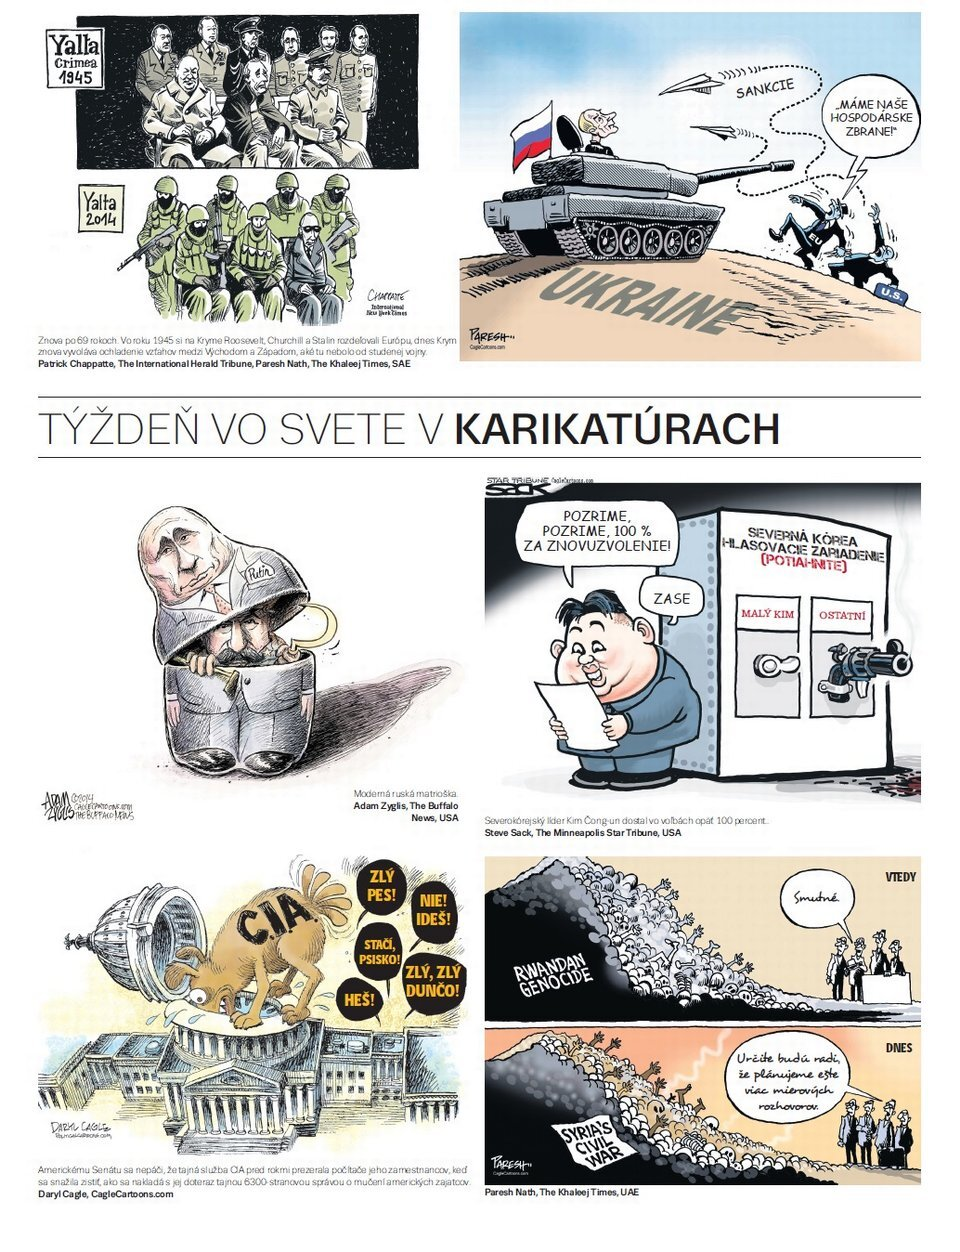 karikatury_res_res.jpg